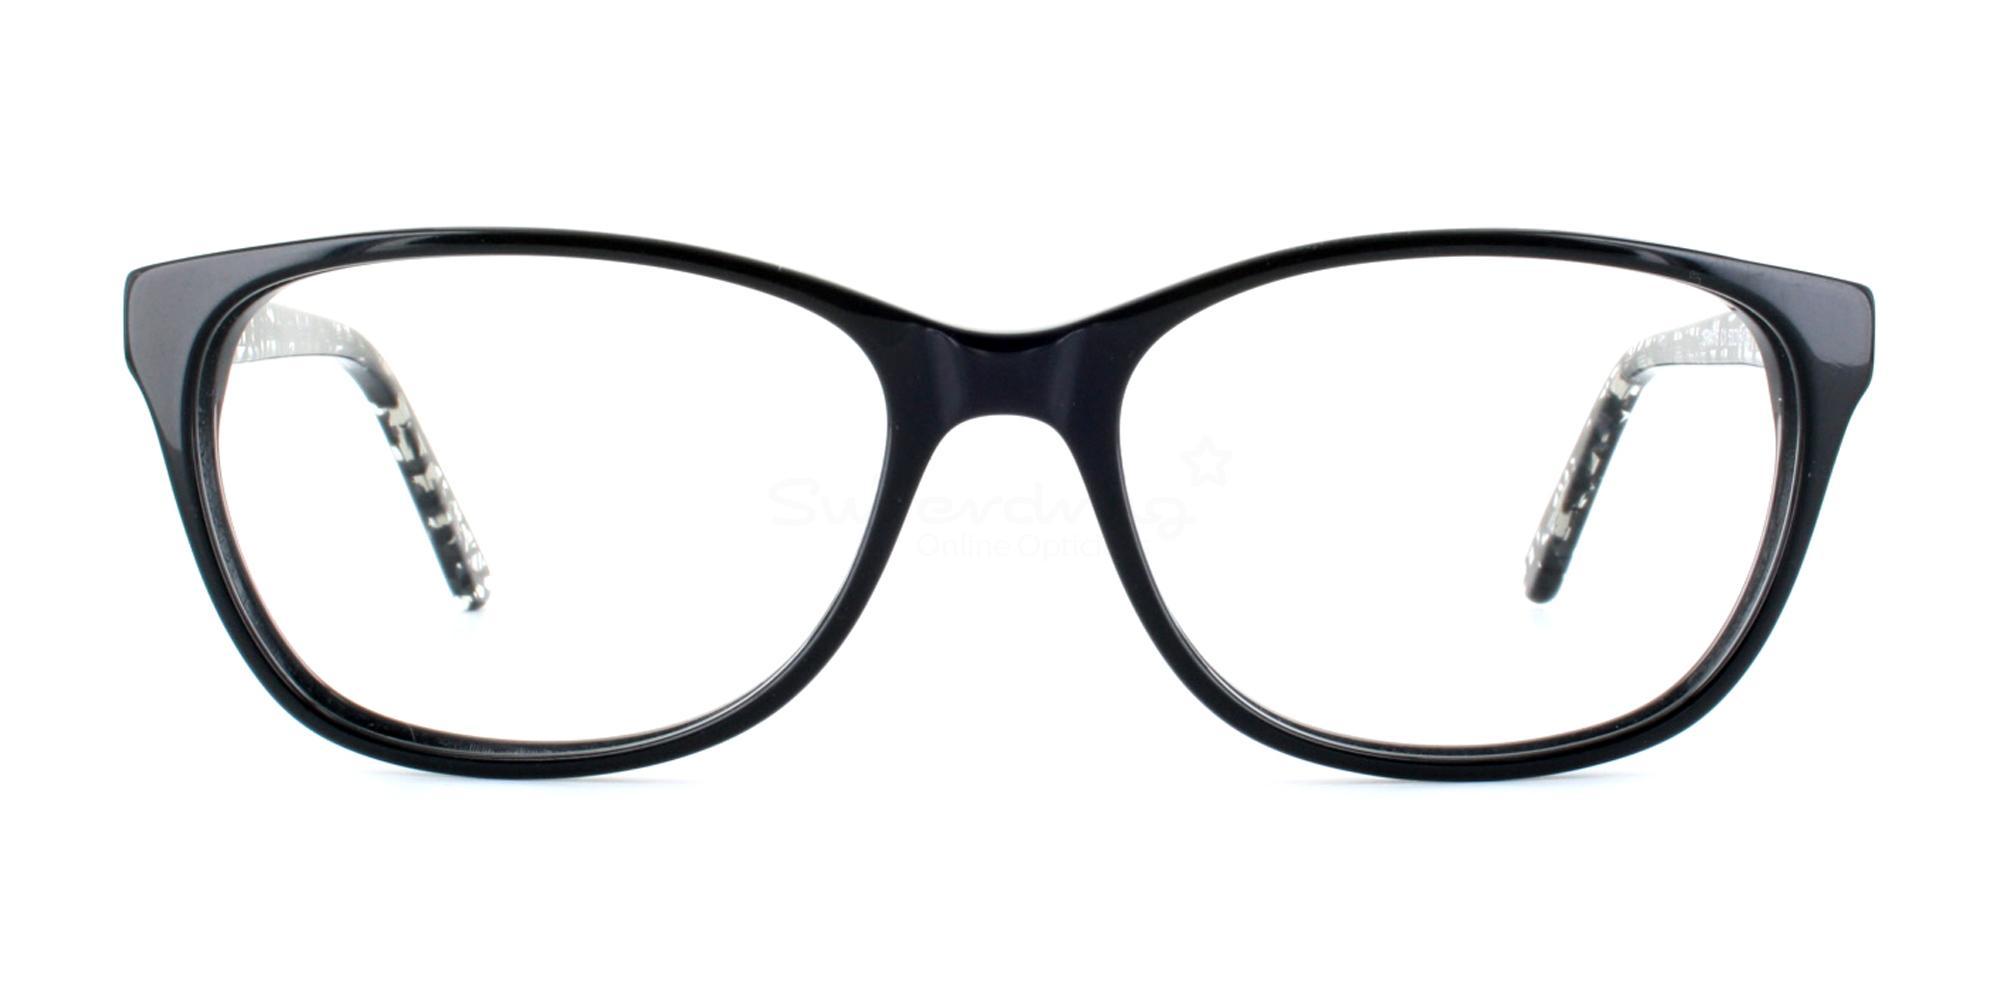 C1 SRA116 Glasses, Neon